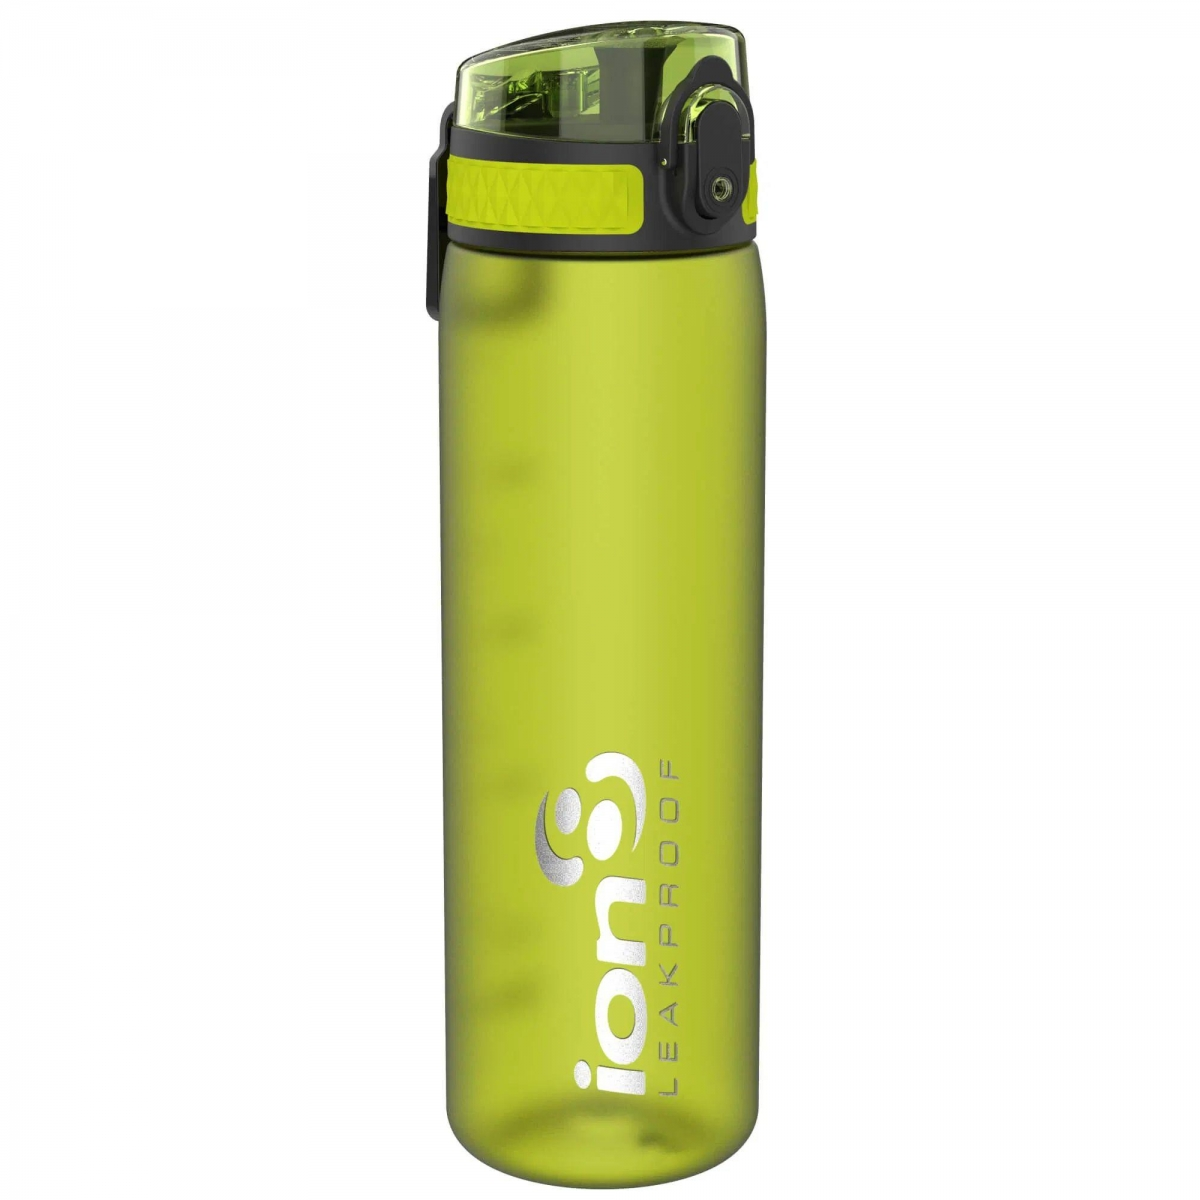 Lahev na vodu Ion8 One Touch Green, 500 ml - zelená